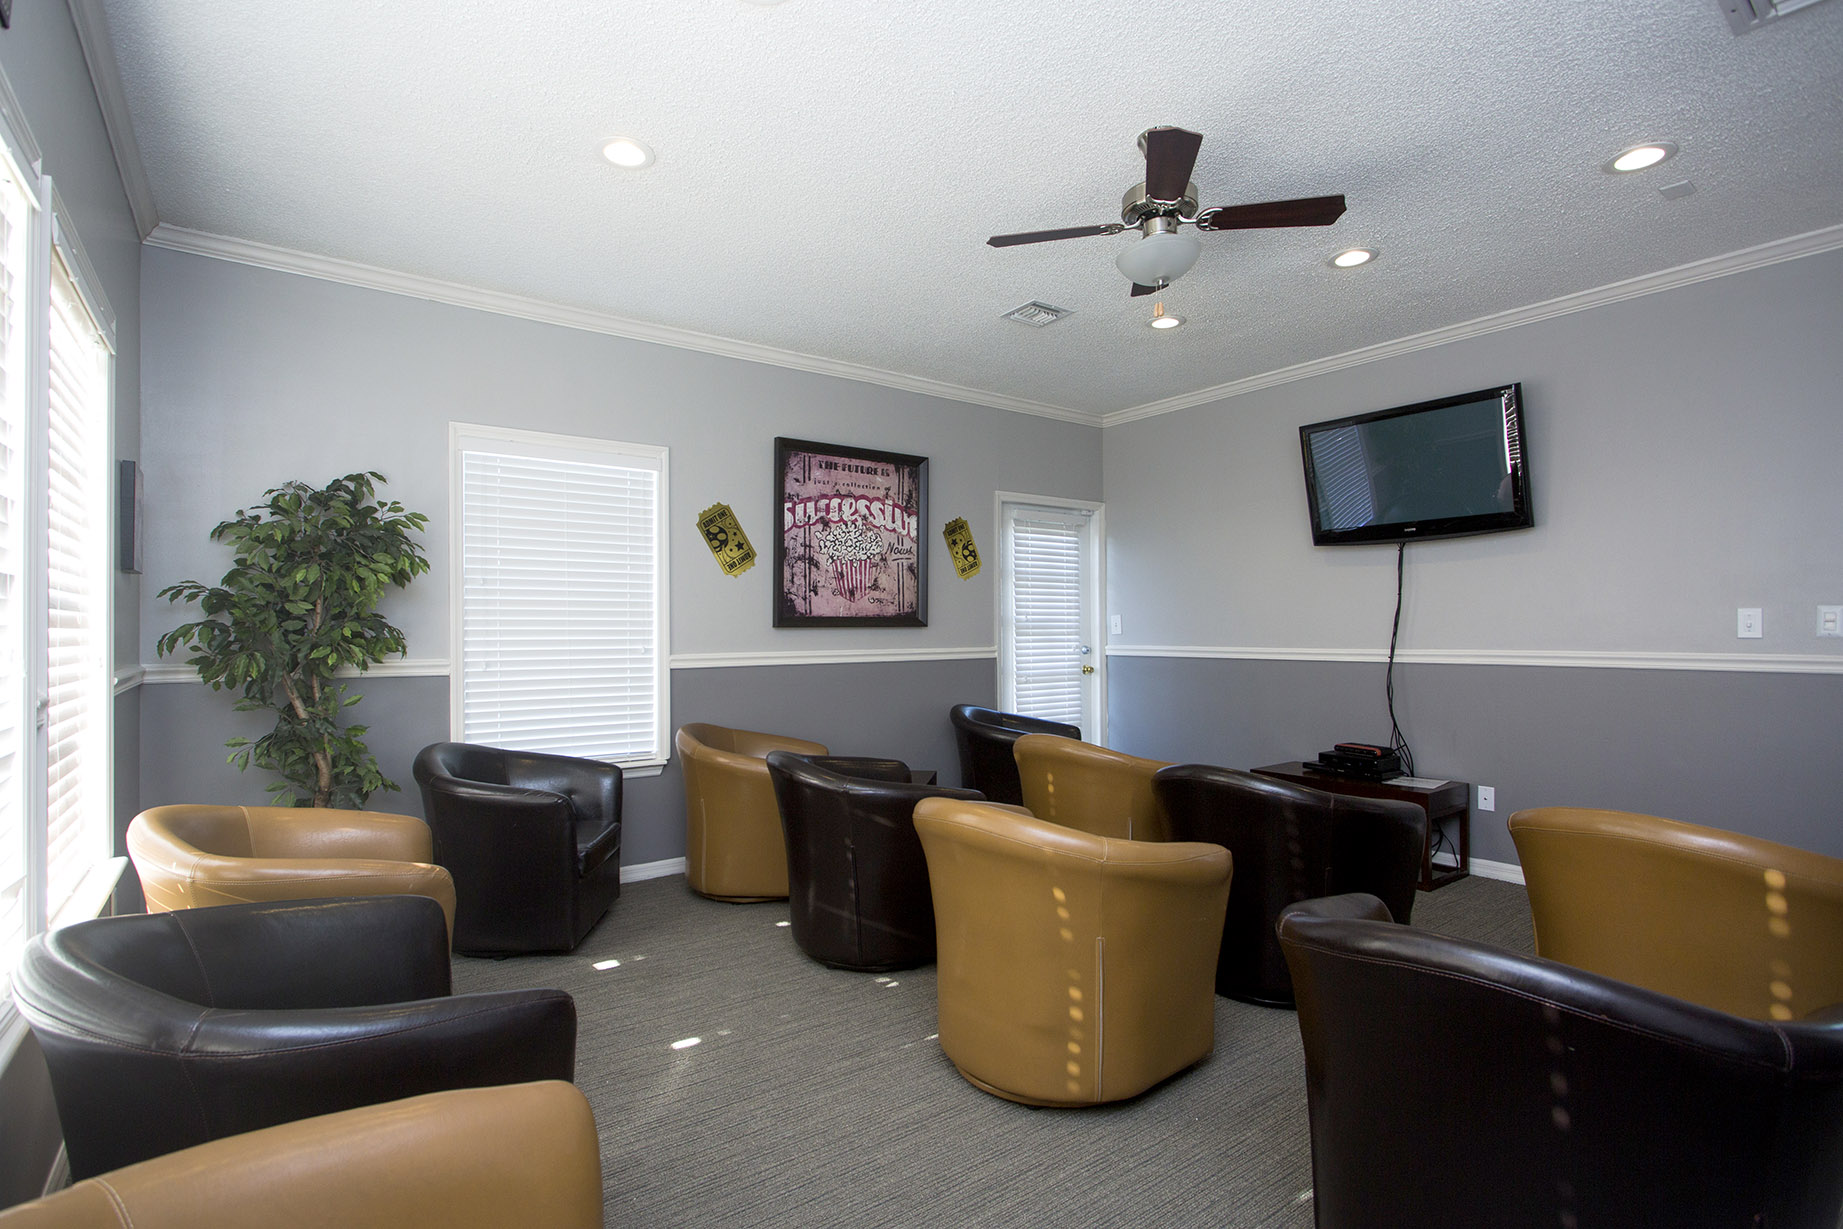 CharlestonLandings-Rental-Apartment-Brandon-Florida-Media-Center2